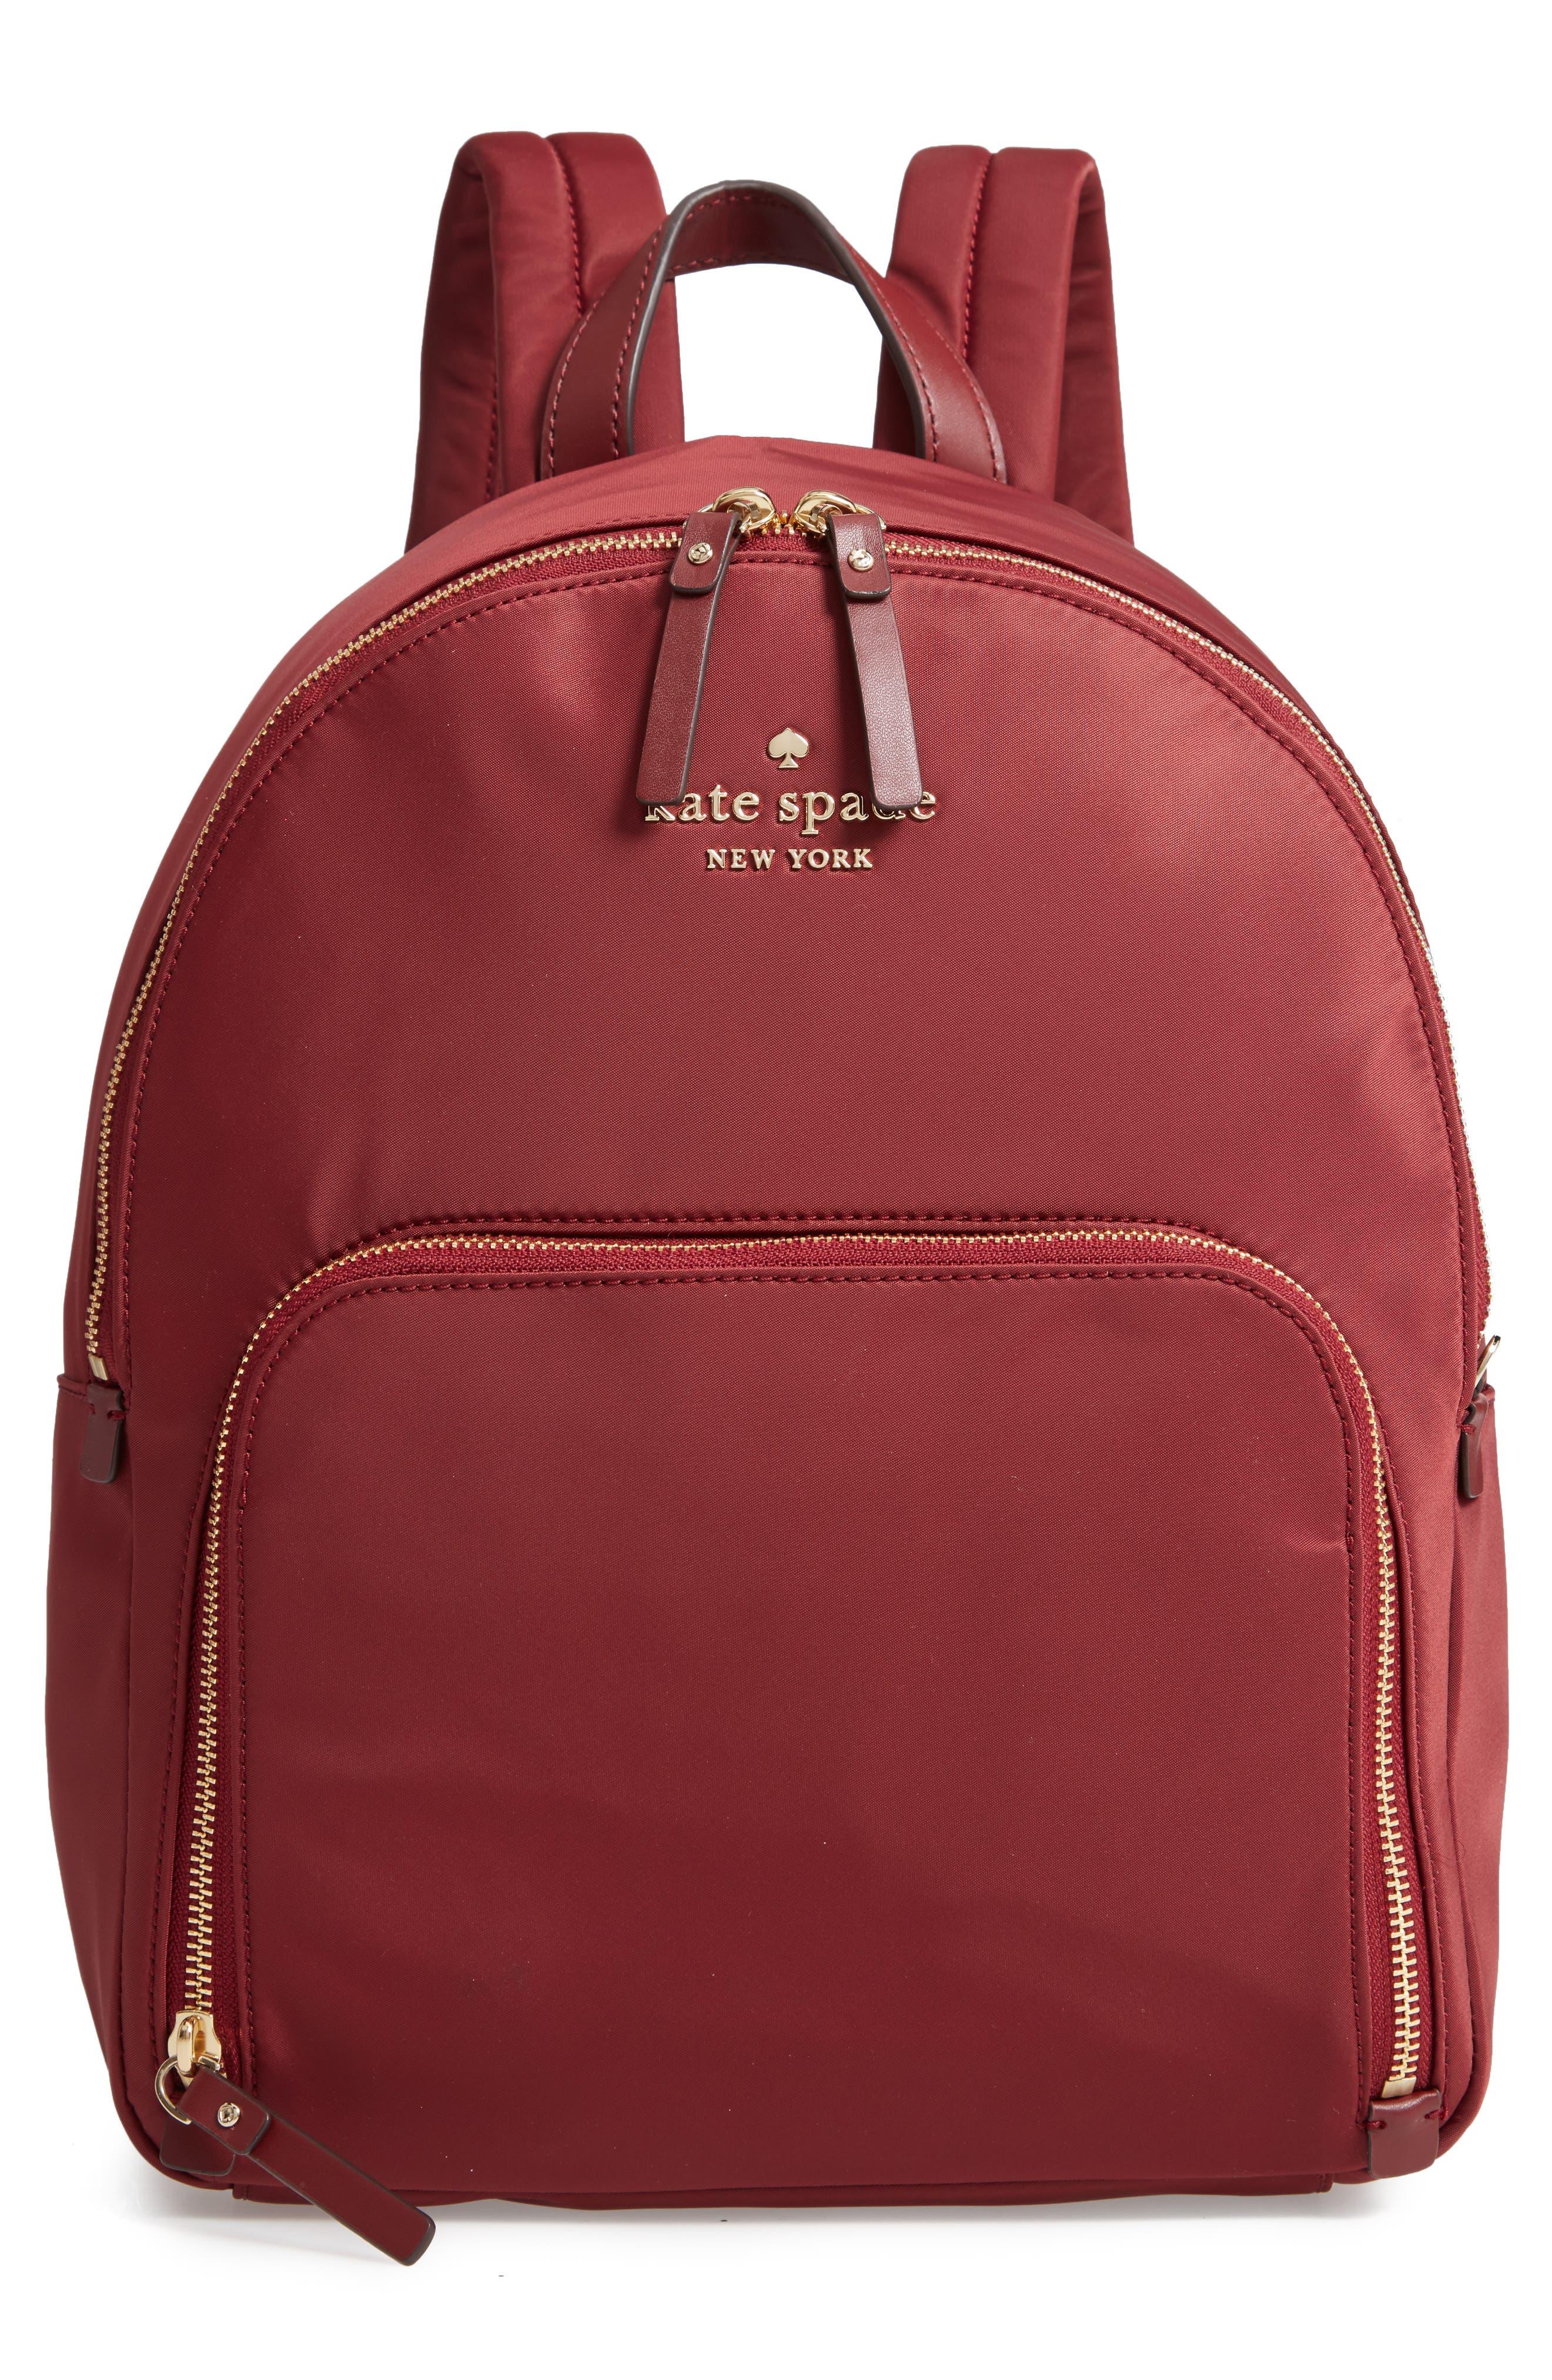 Watson Lane - Hartley Nylon Backpack - Red, Dark Currant